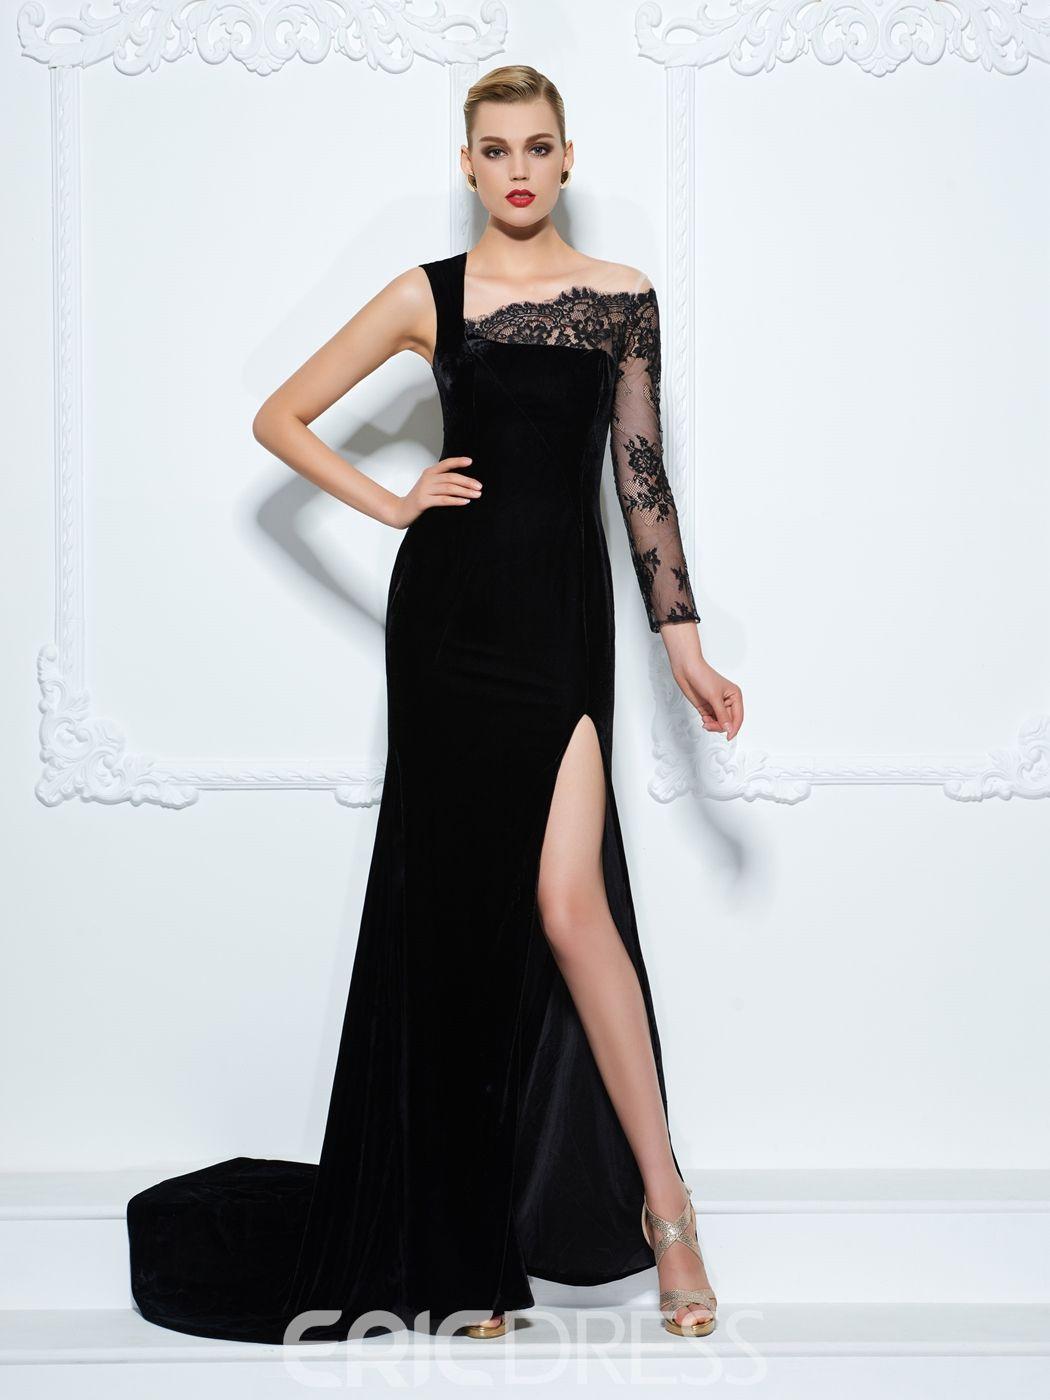 7d89233978c60 Pin by Ilse Rademeyer on Wedding | Evening dresses, Dresses, Evening ...